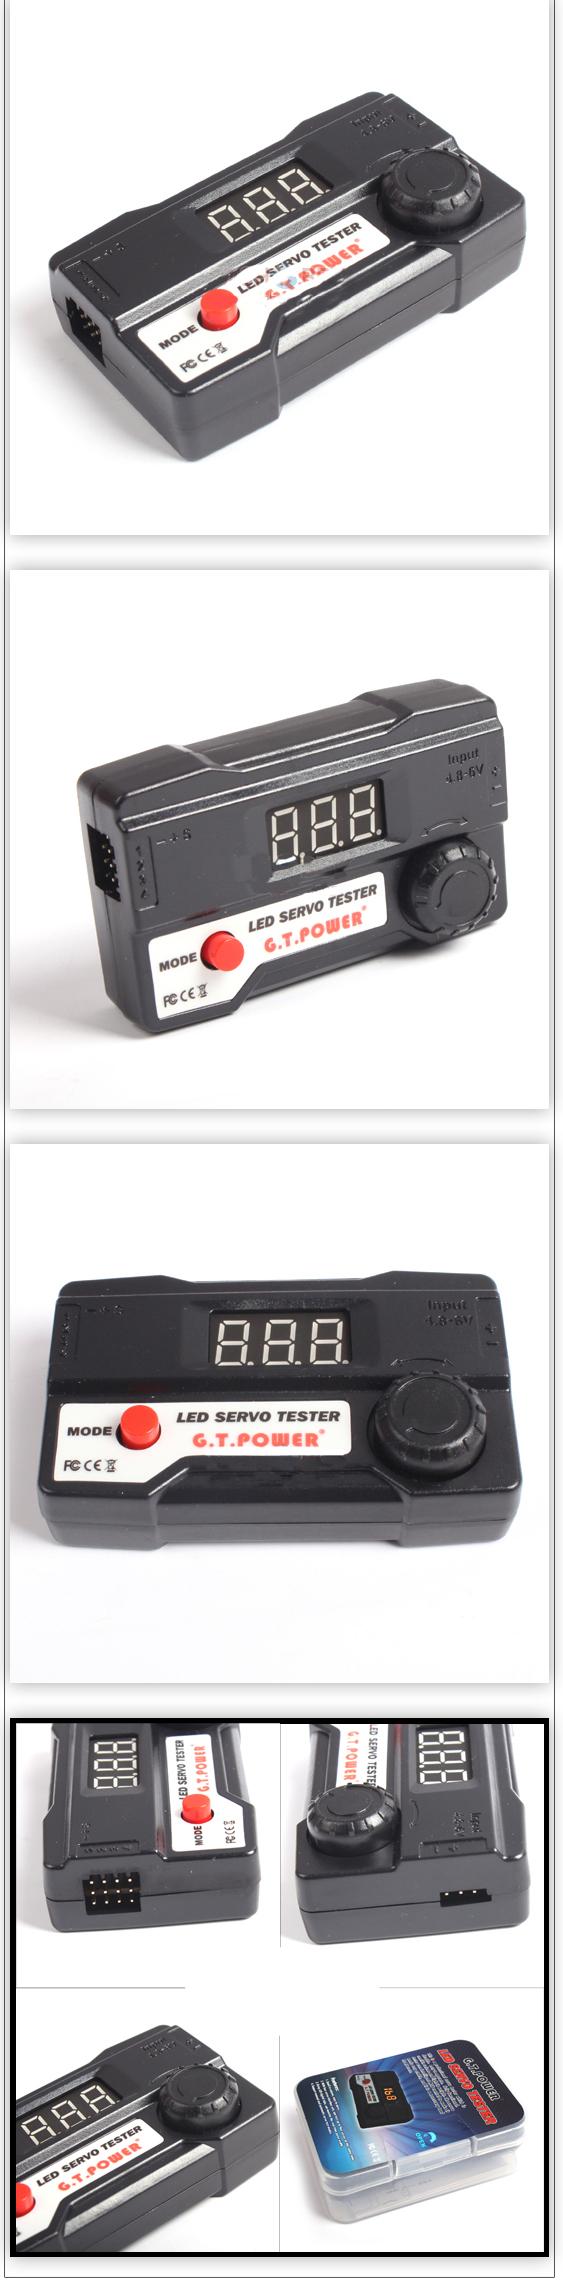 Digital Tube Tester : Buy gt power led digital tube servo tester bazaargadgets